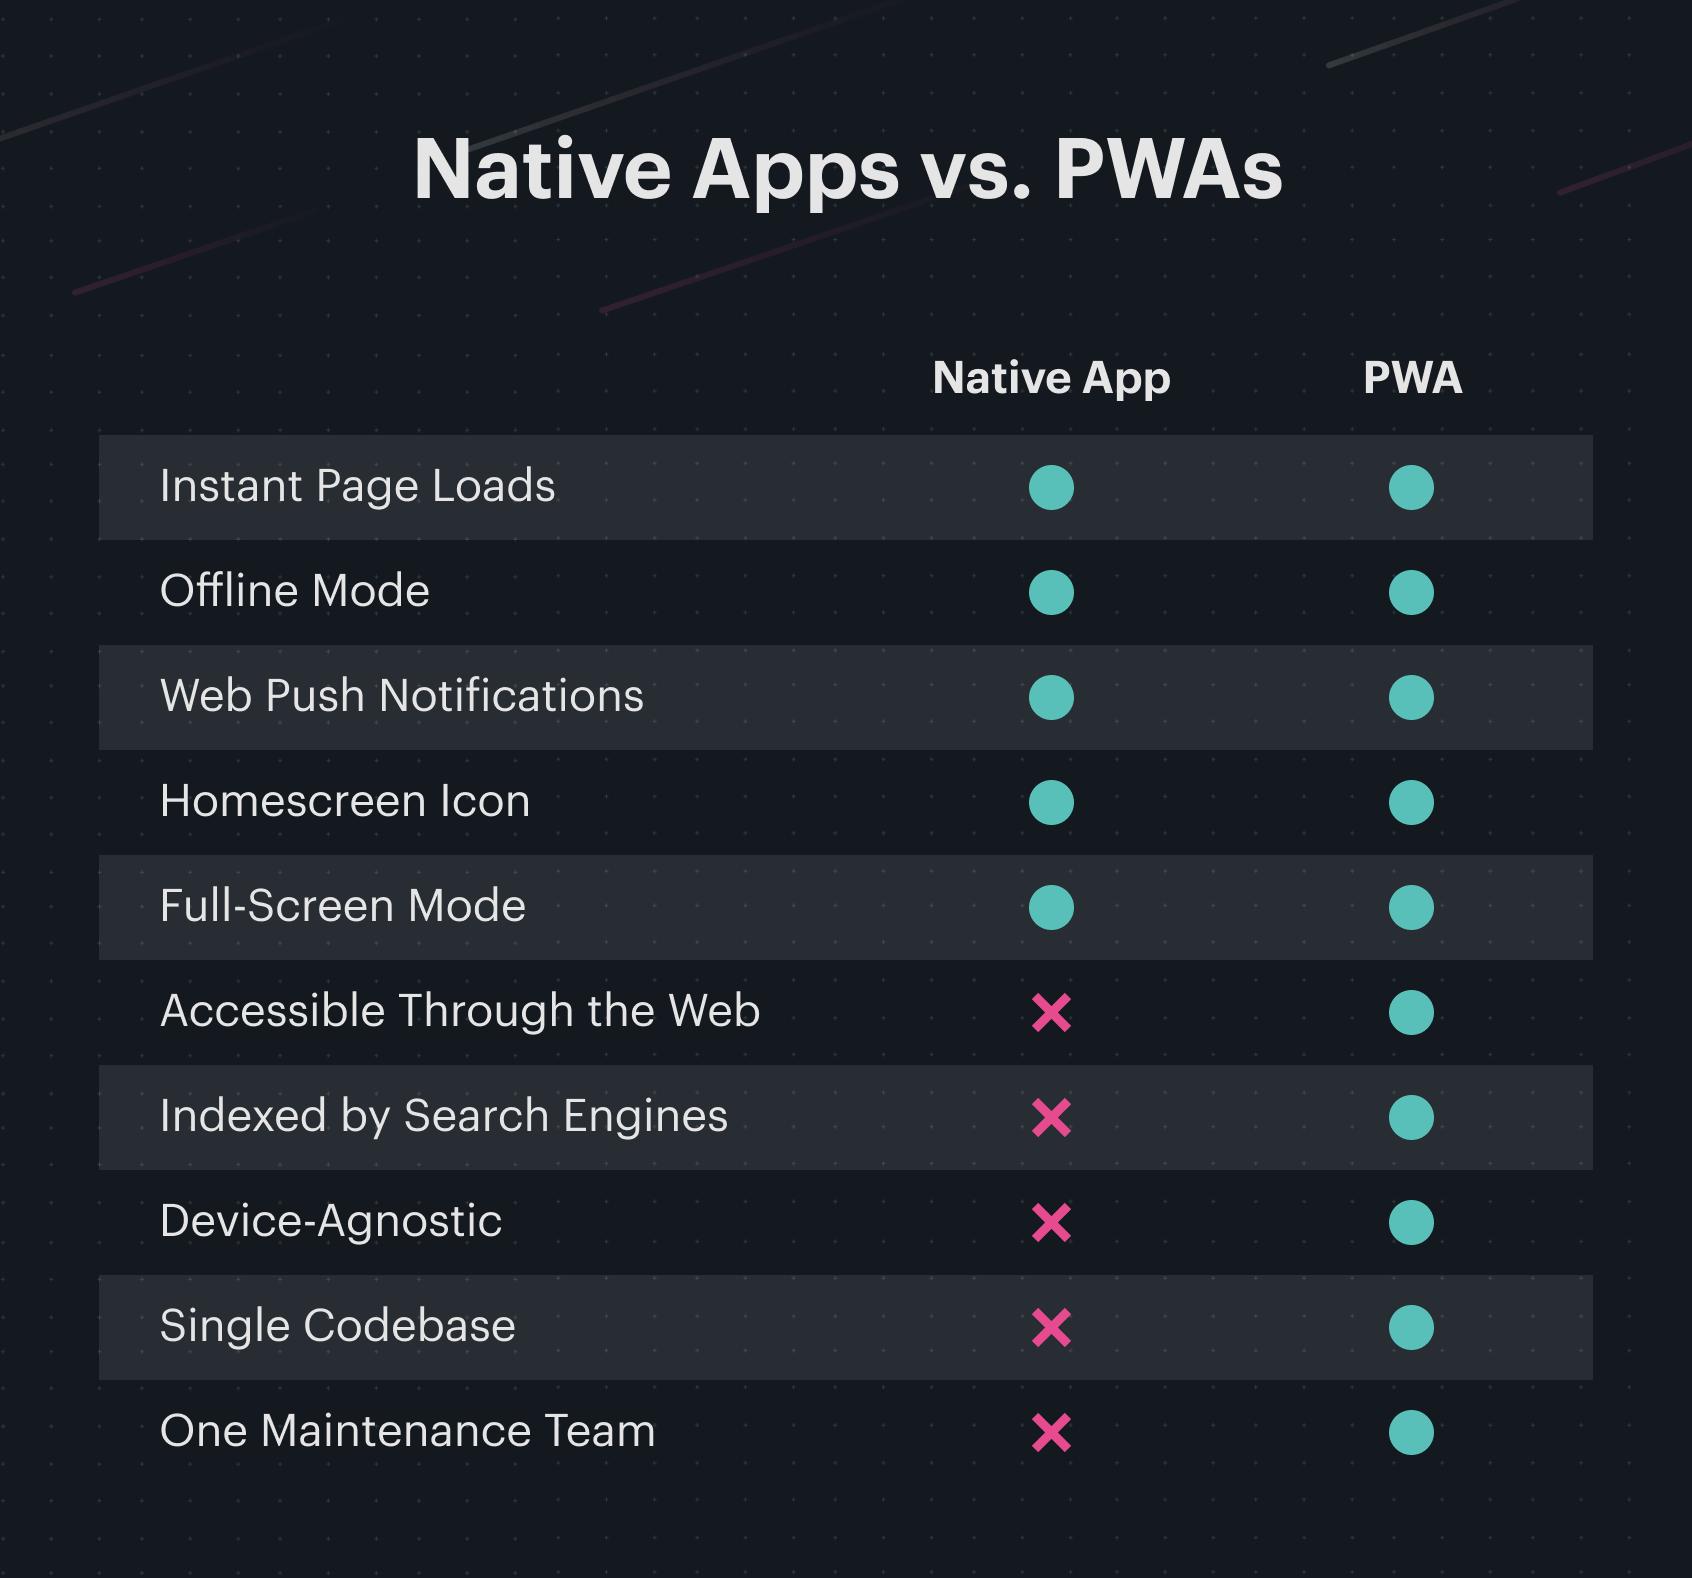 breakdown of features between native apps and pwas